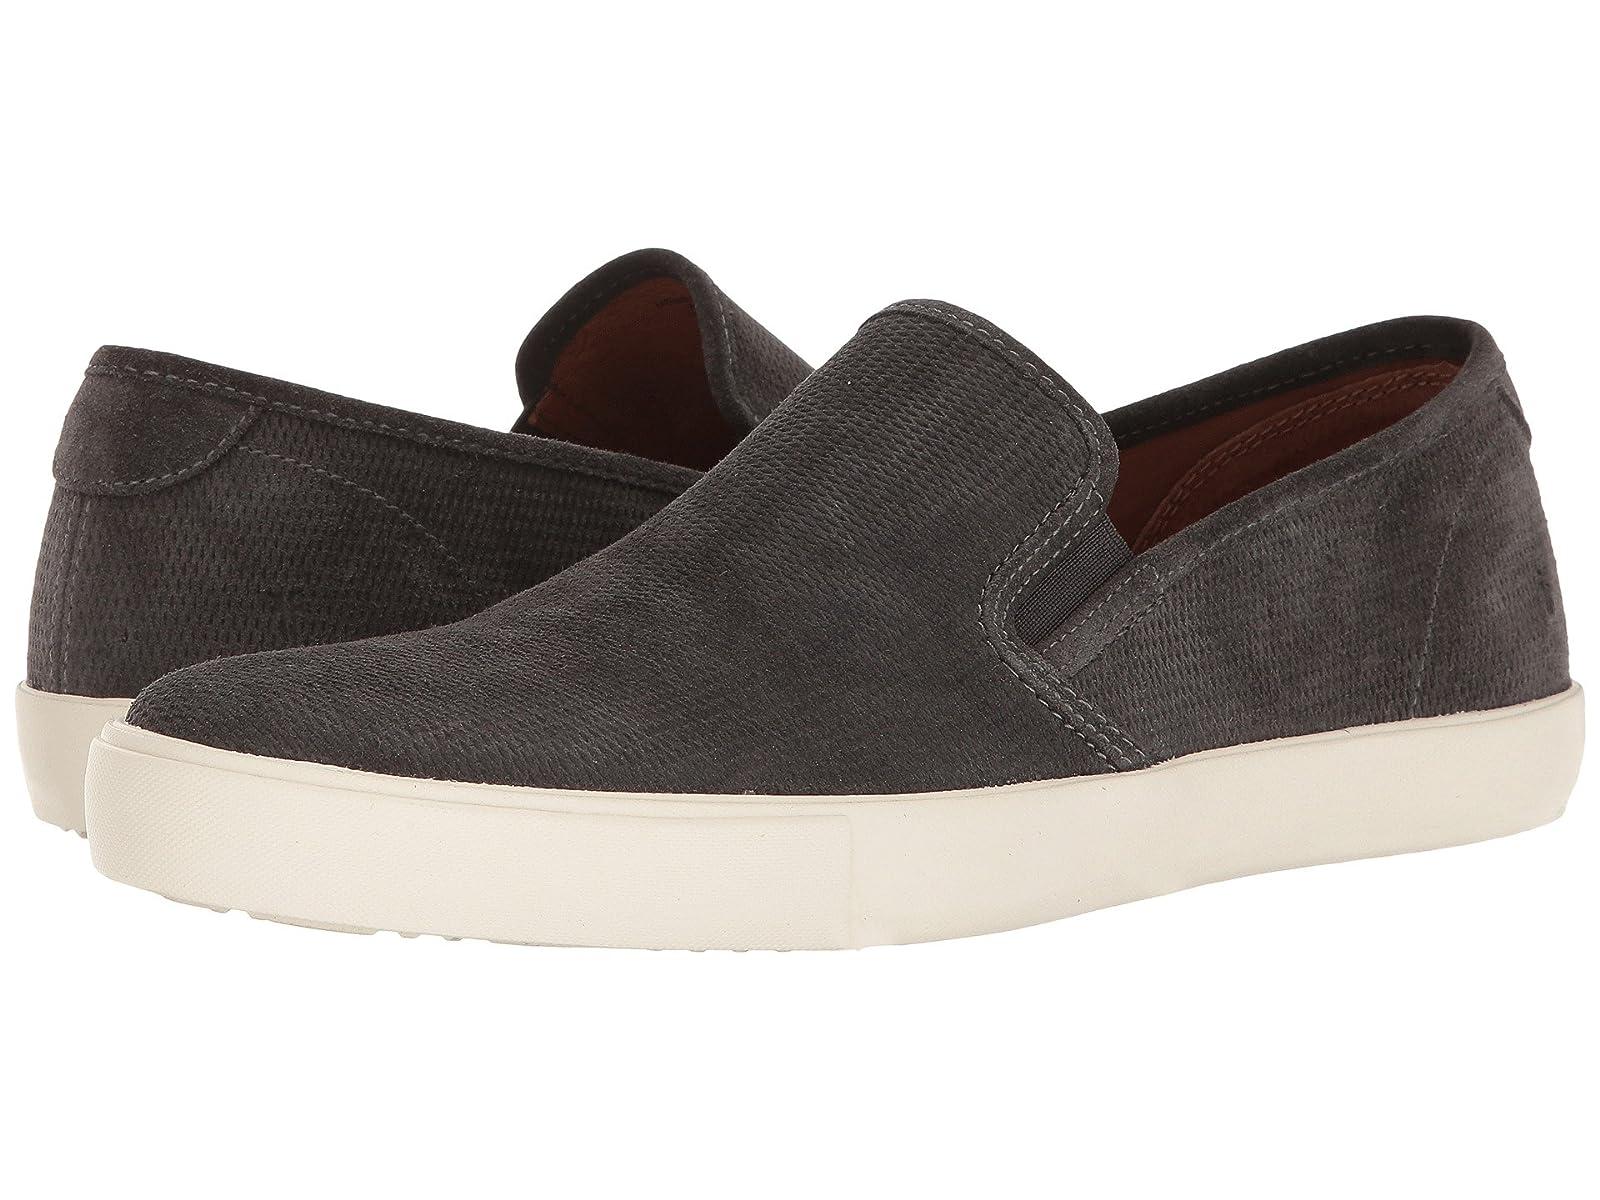 Frye Brett Perf Slip-OnCheap and distinctive eye-catching shoes